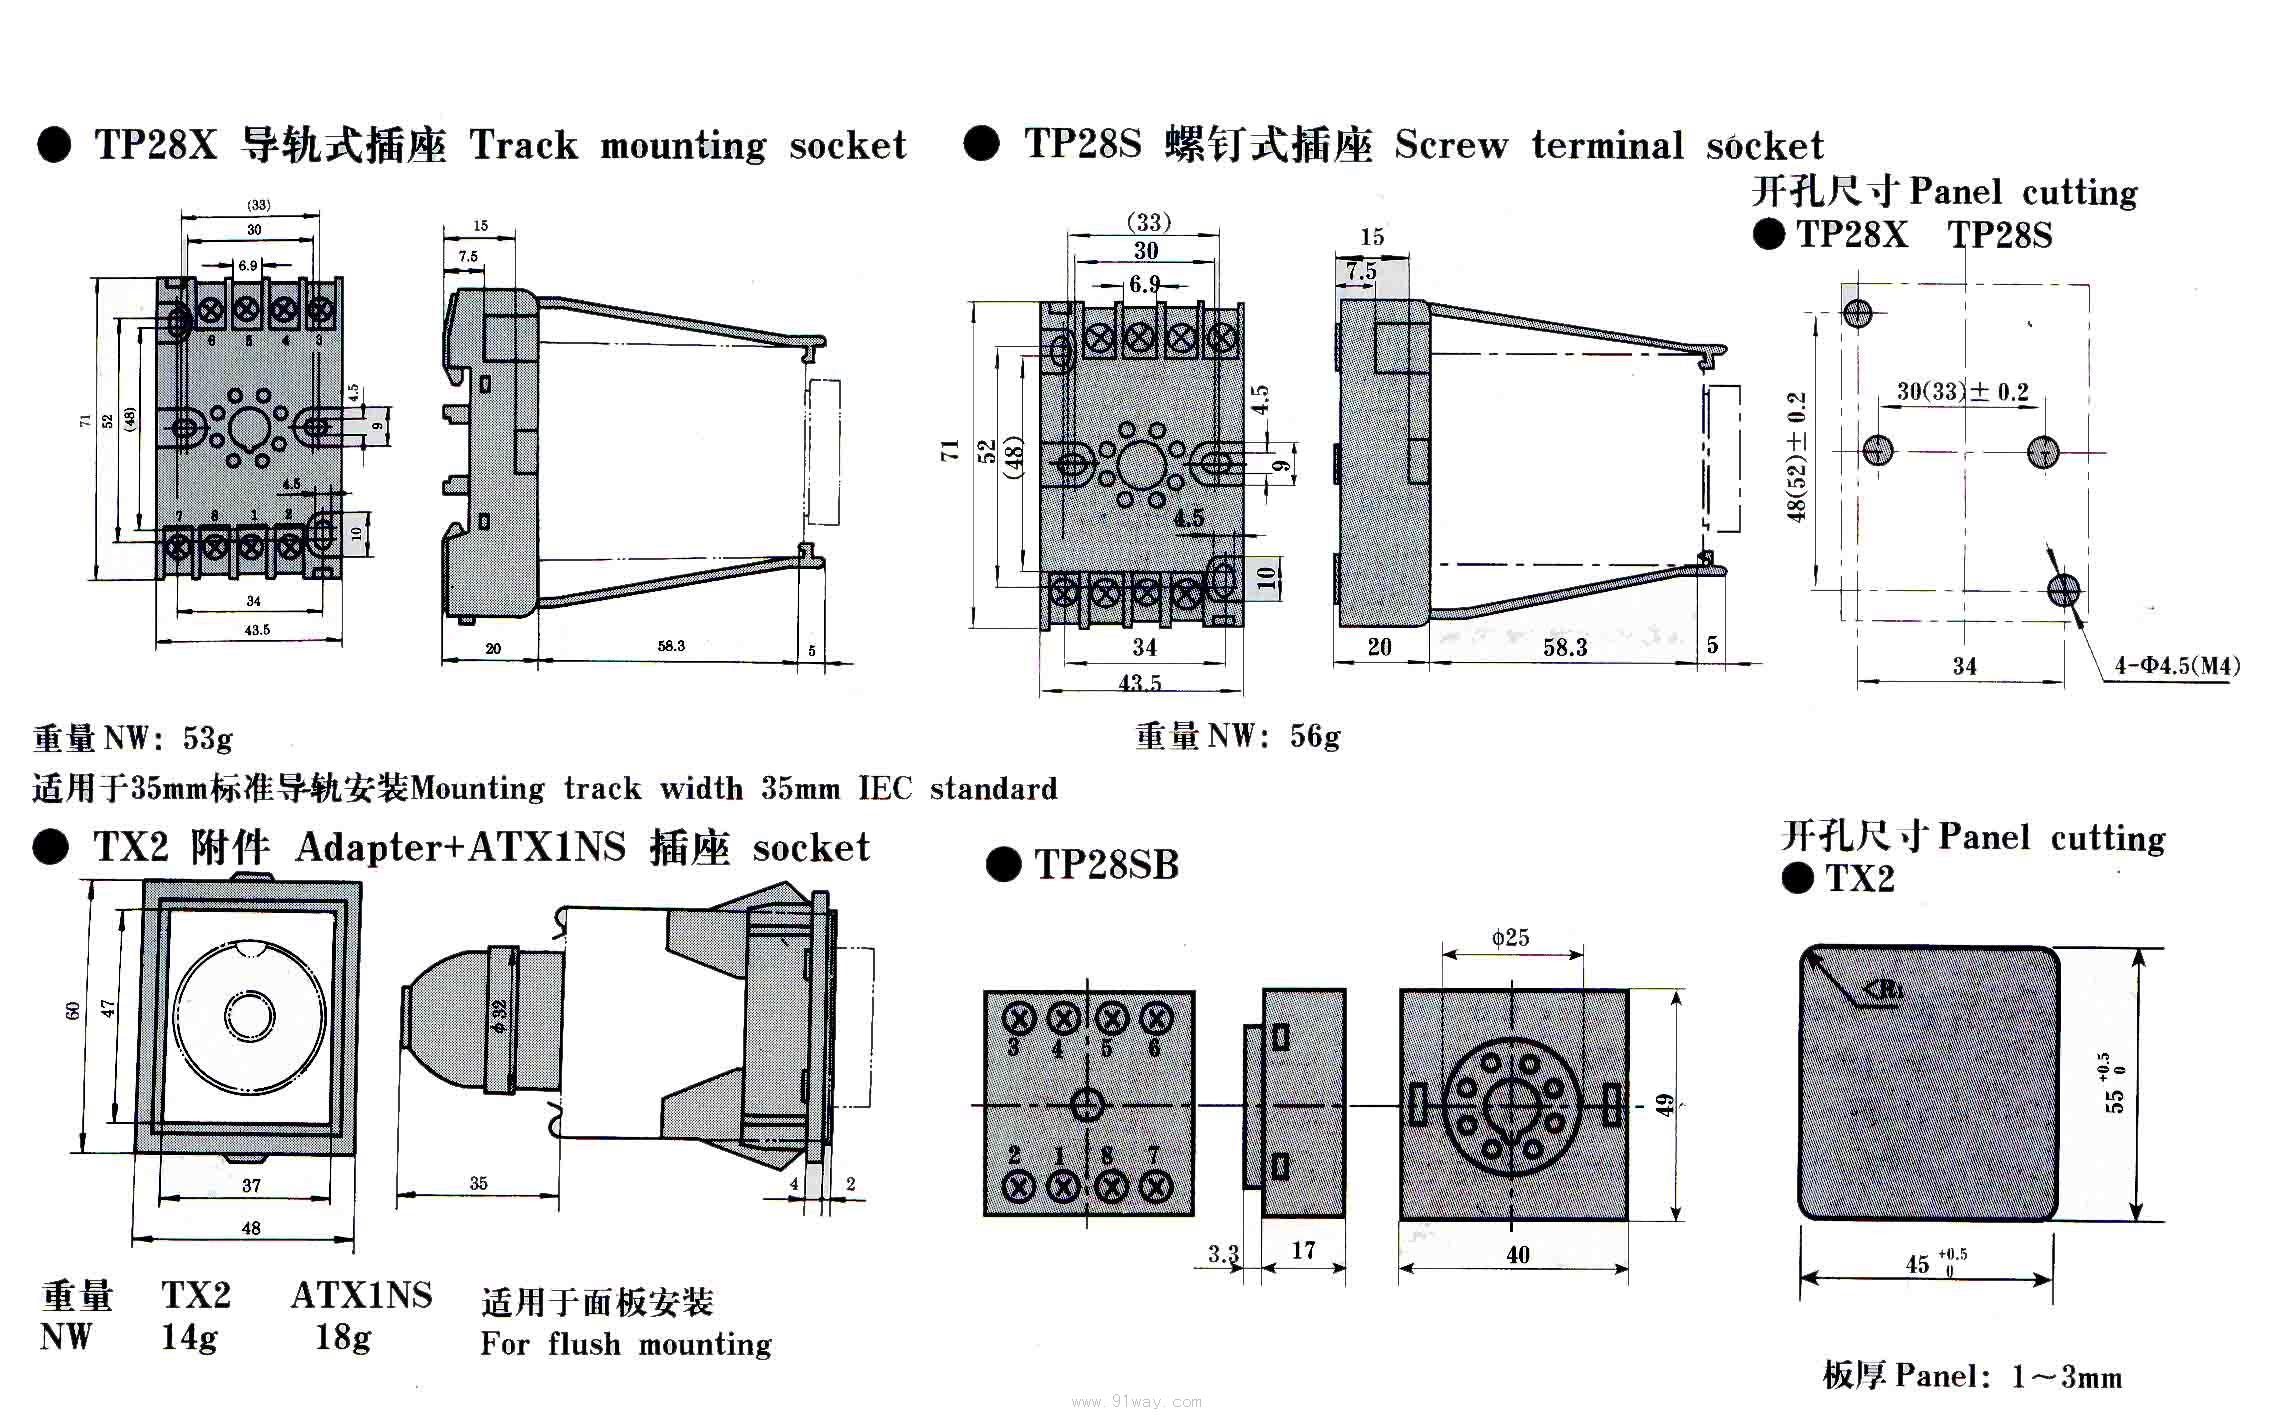 ST3P系列时间继电器是引进日本富士电机株式会社全套专有技术生产的新颖电子式时间继电器,具有体积小、重量轻、延时精度高、延时范围广、抗干扰性能强、可靠性好、寿命长等特点,适用于各种要求高精度、高可靠性自动控制的场合作延时控制之用,产品符合GB14048标准。